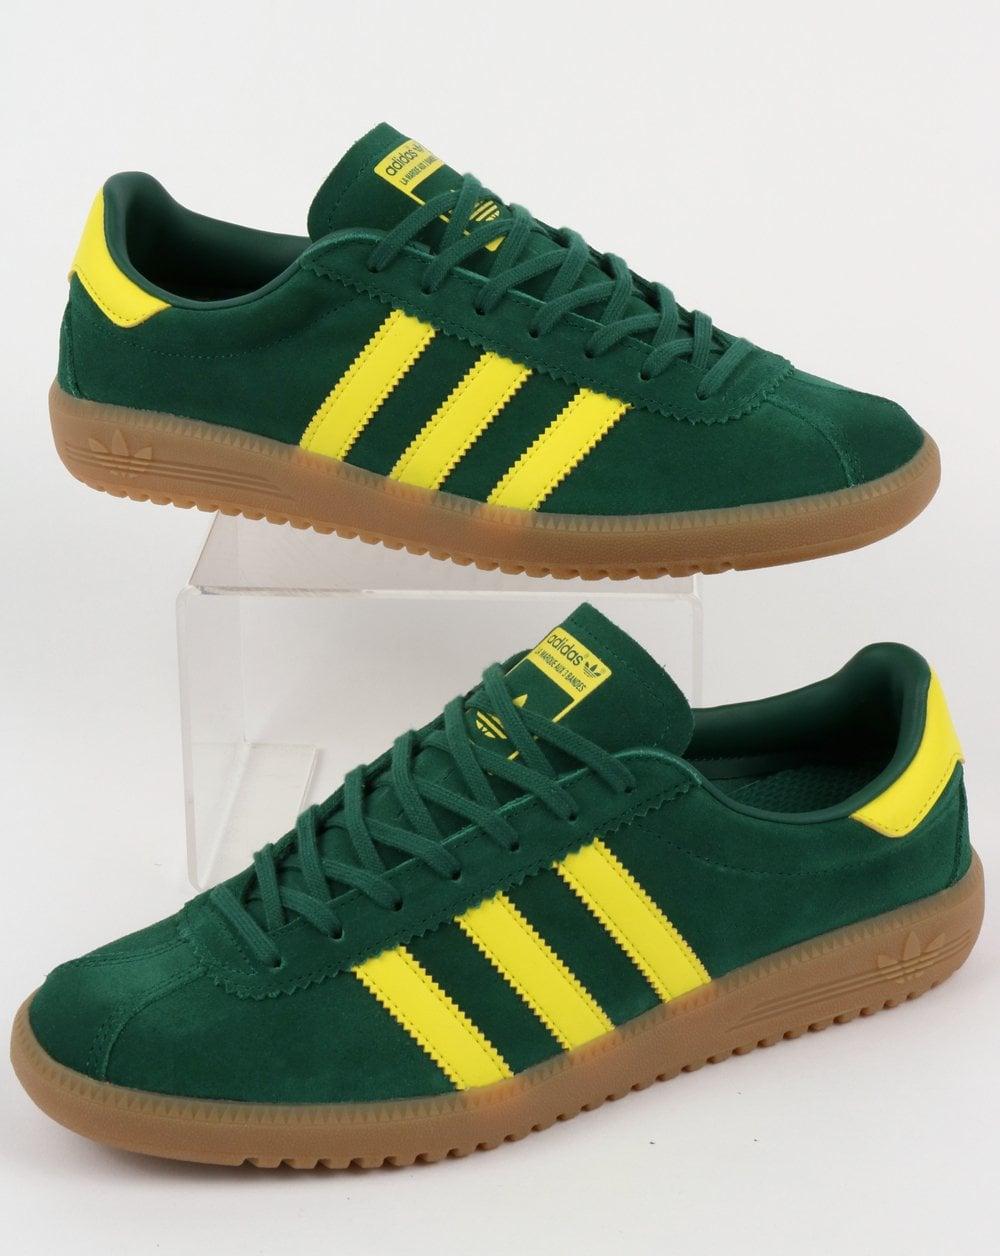 Adidas Bermuda Trainers Green/Yellow